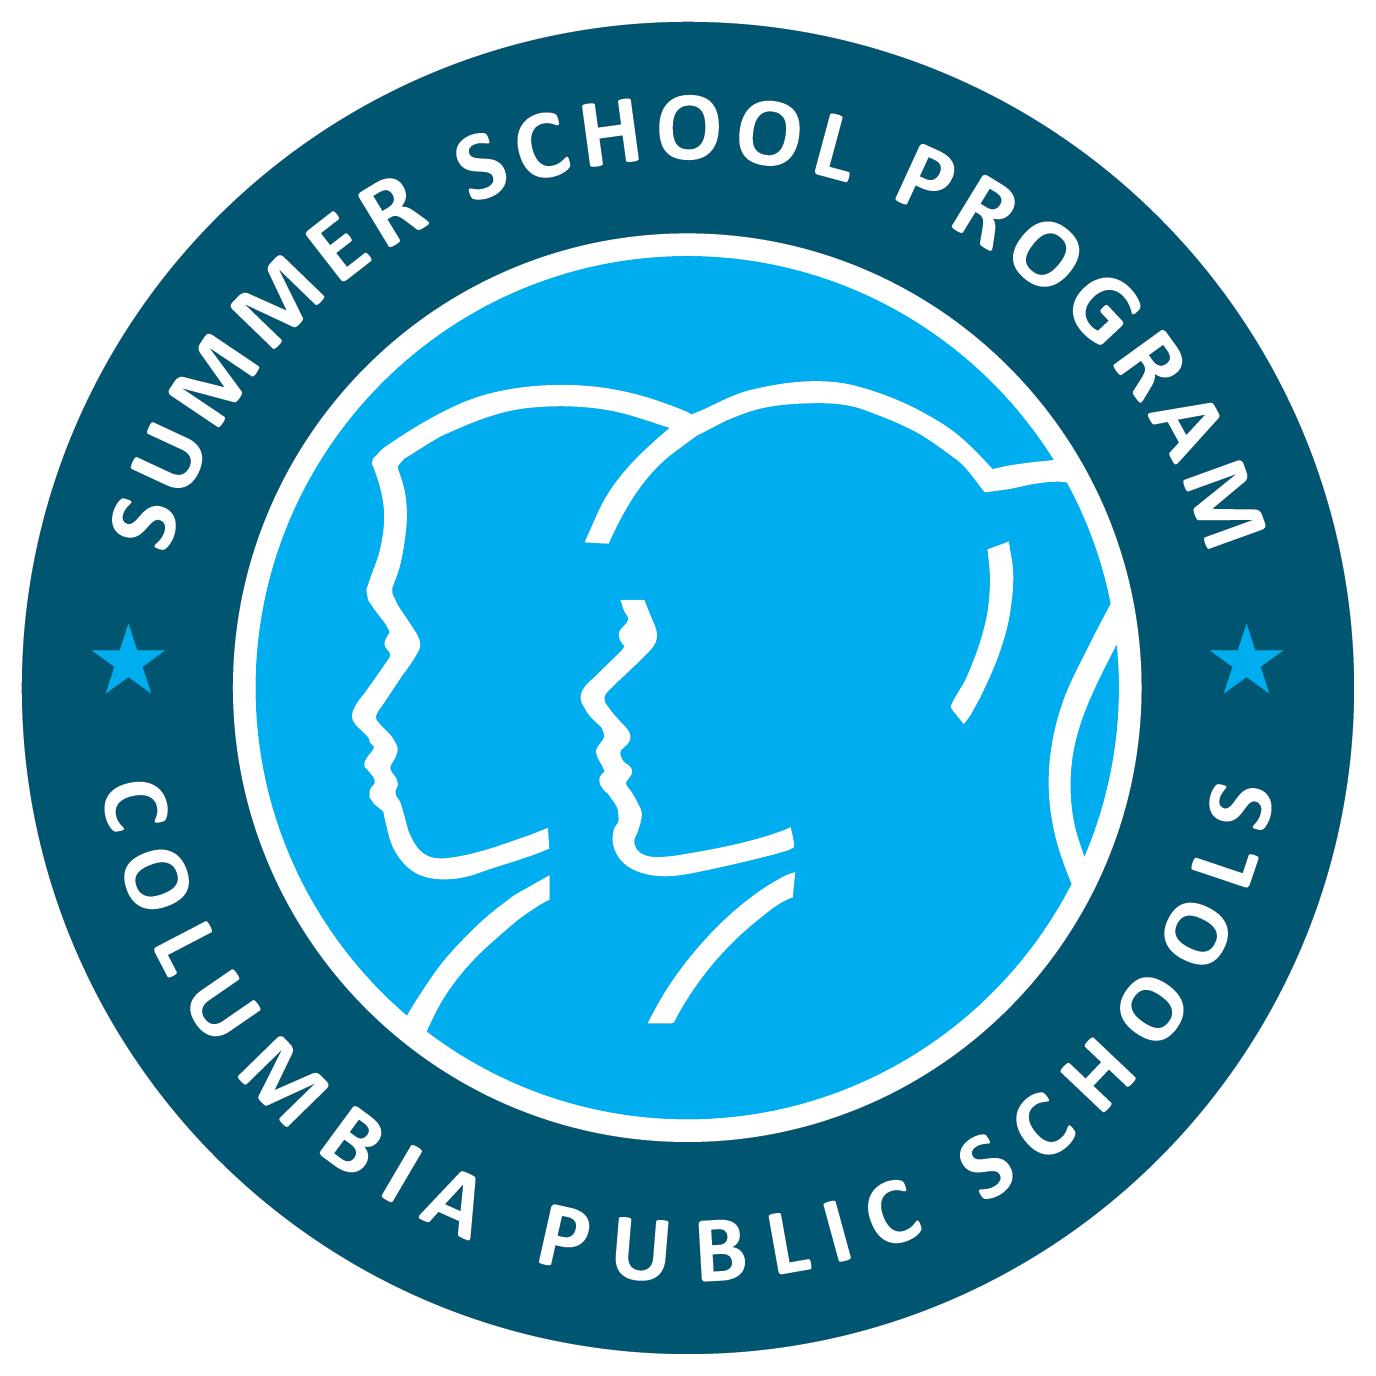 SummerSchoolProgramLogo